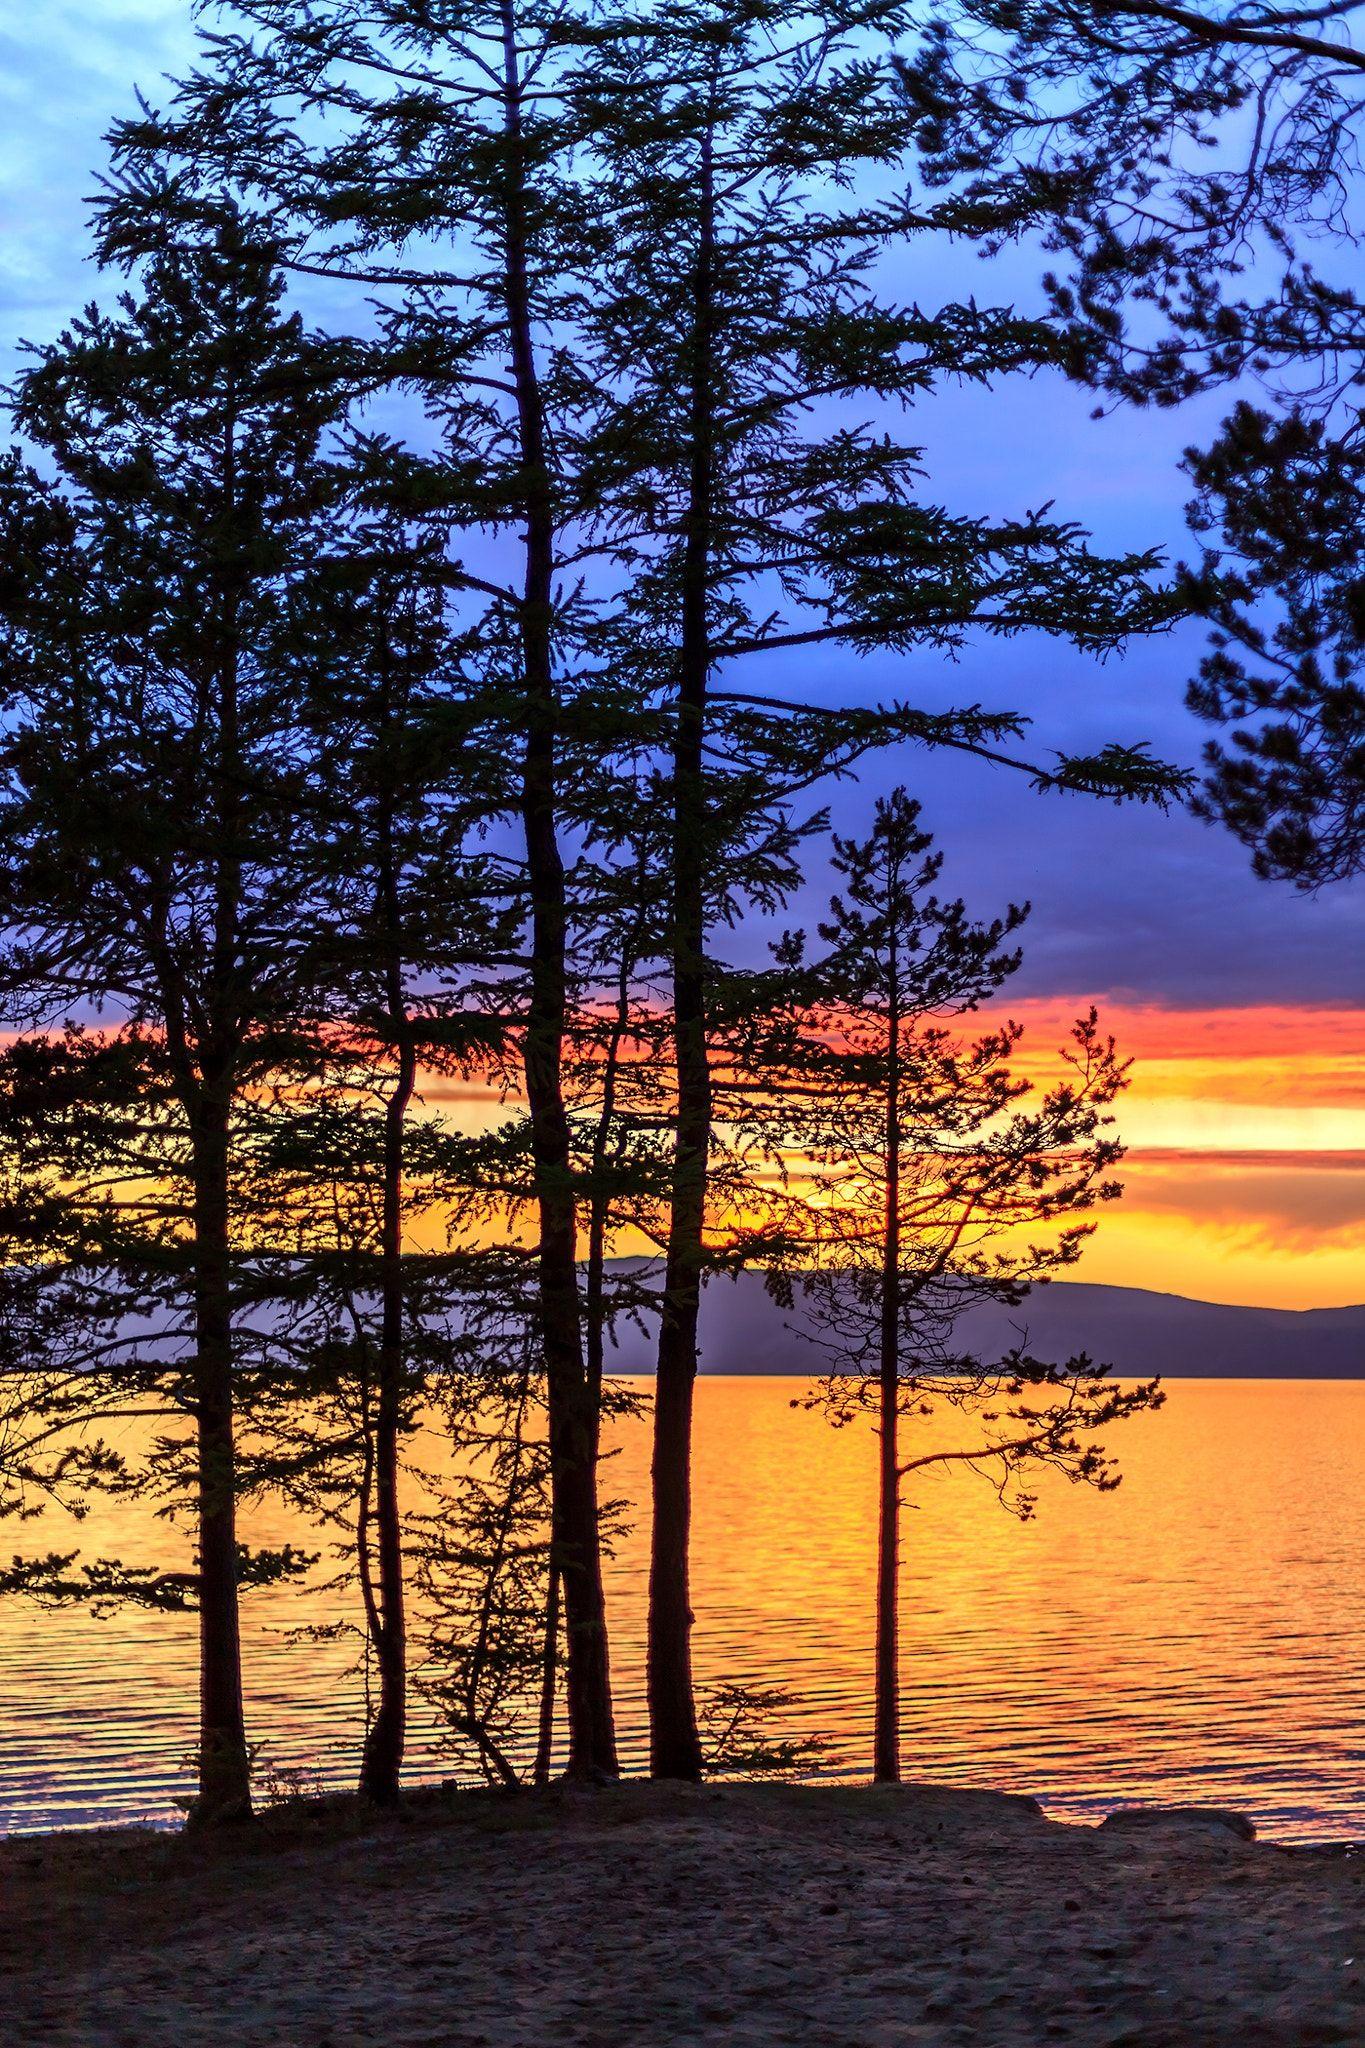 Good Evening No Words Sunset Img 3418 Jpg Null Fotografia Del Cielo Paisaje Marino Fotografia Paisaje